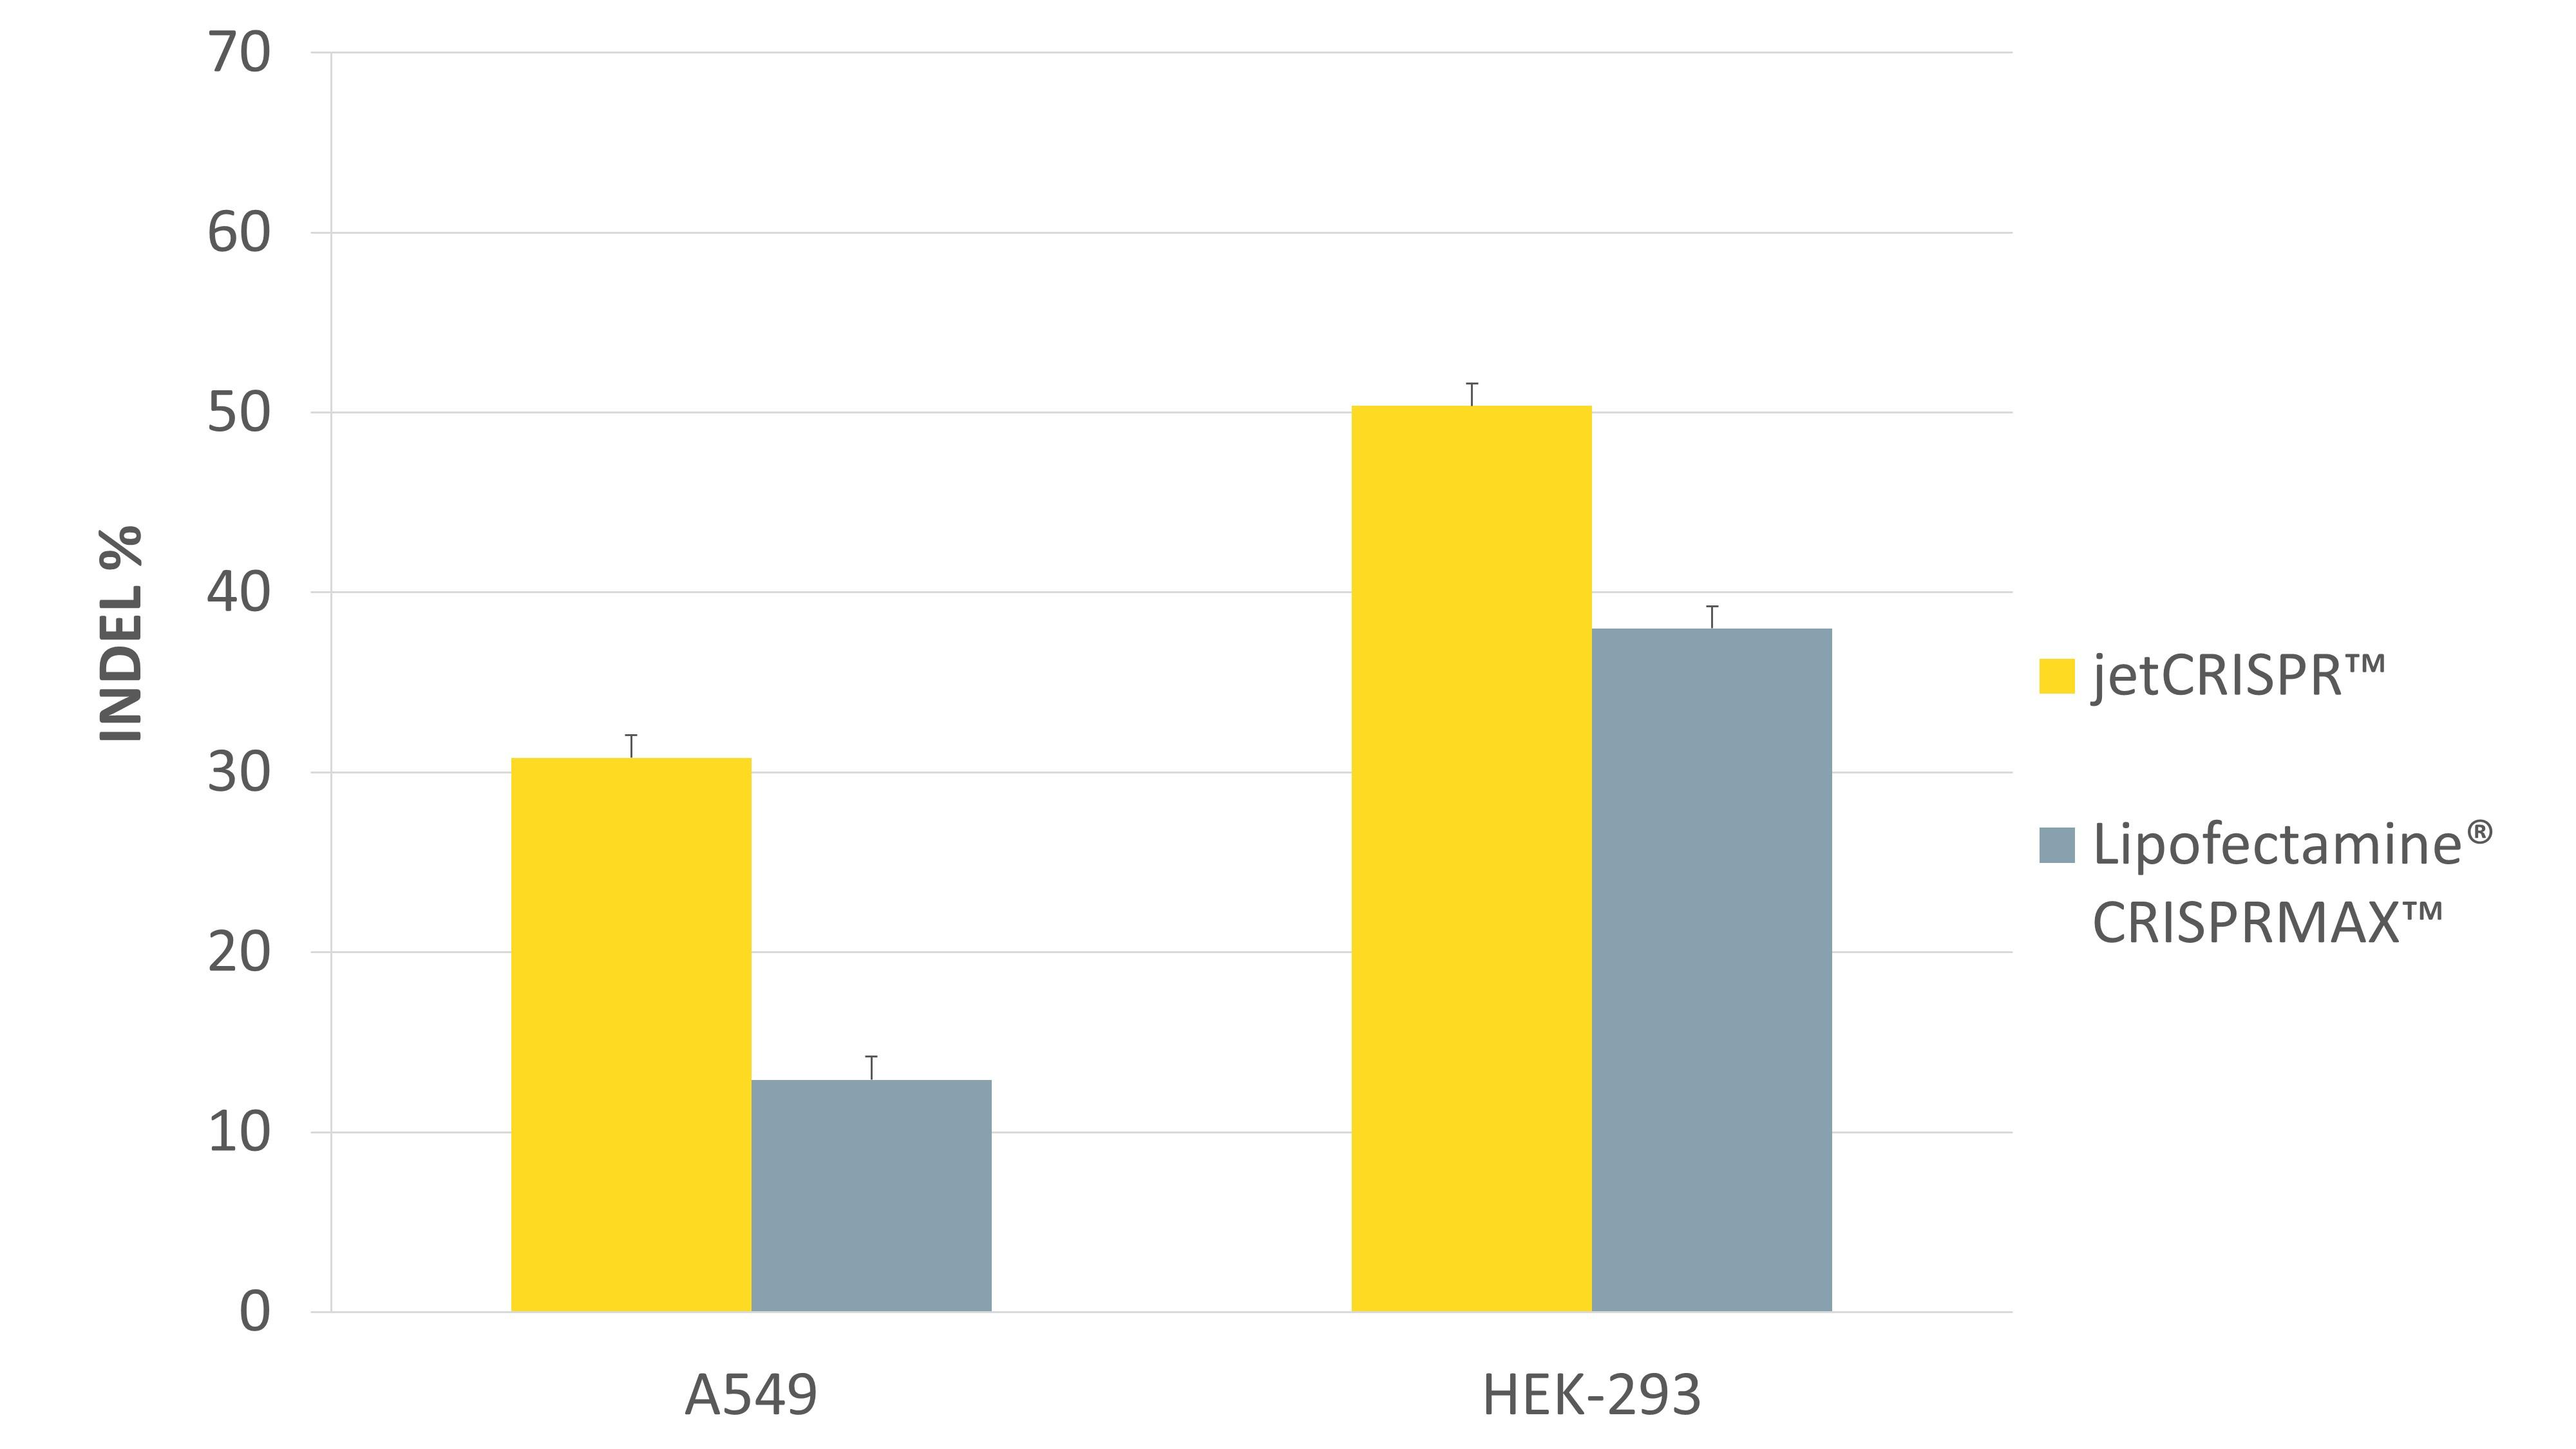 jetCRISPR - Comparison of genome editing efficiency